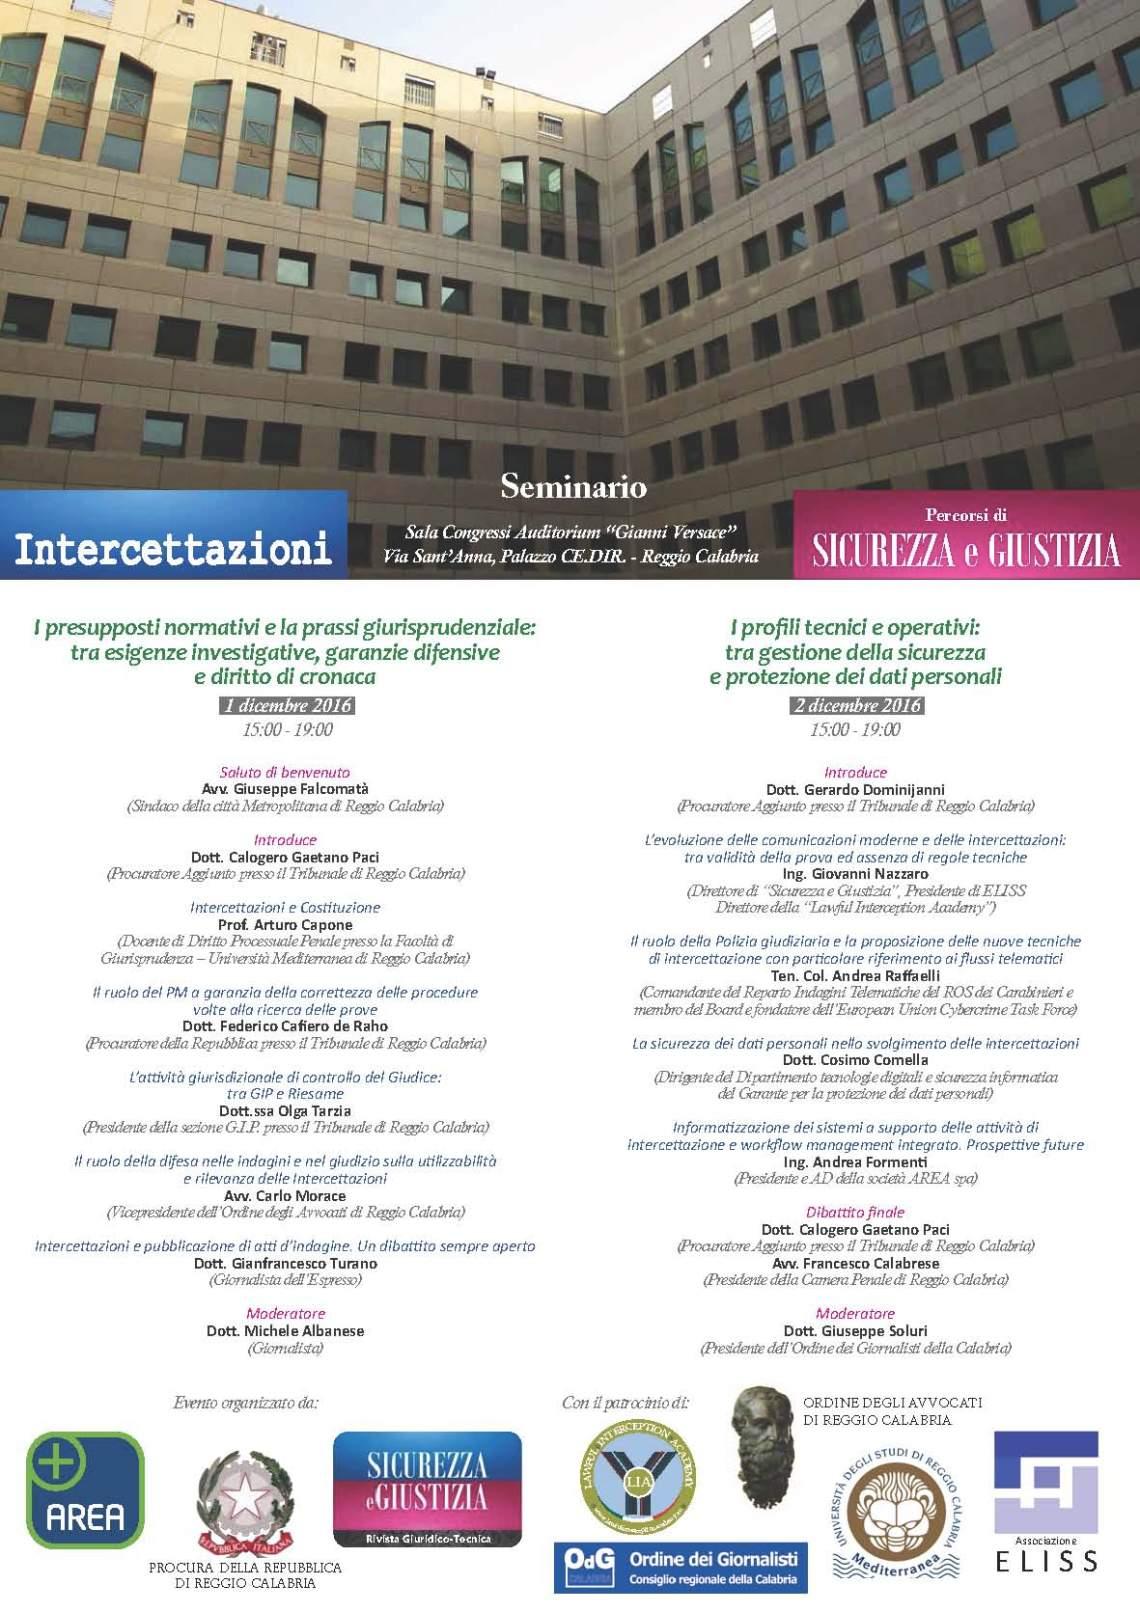 locandina-seminario_reggio_calabria_1-2_dicembre_2016